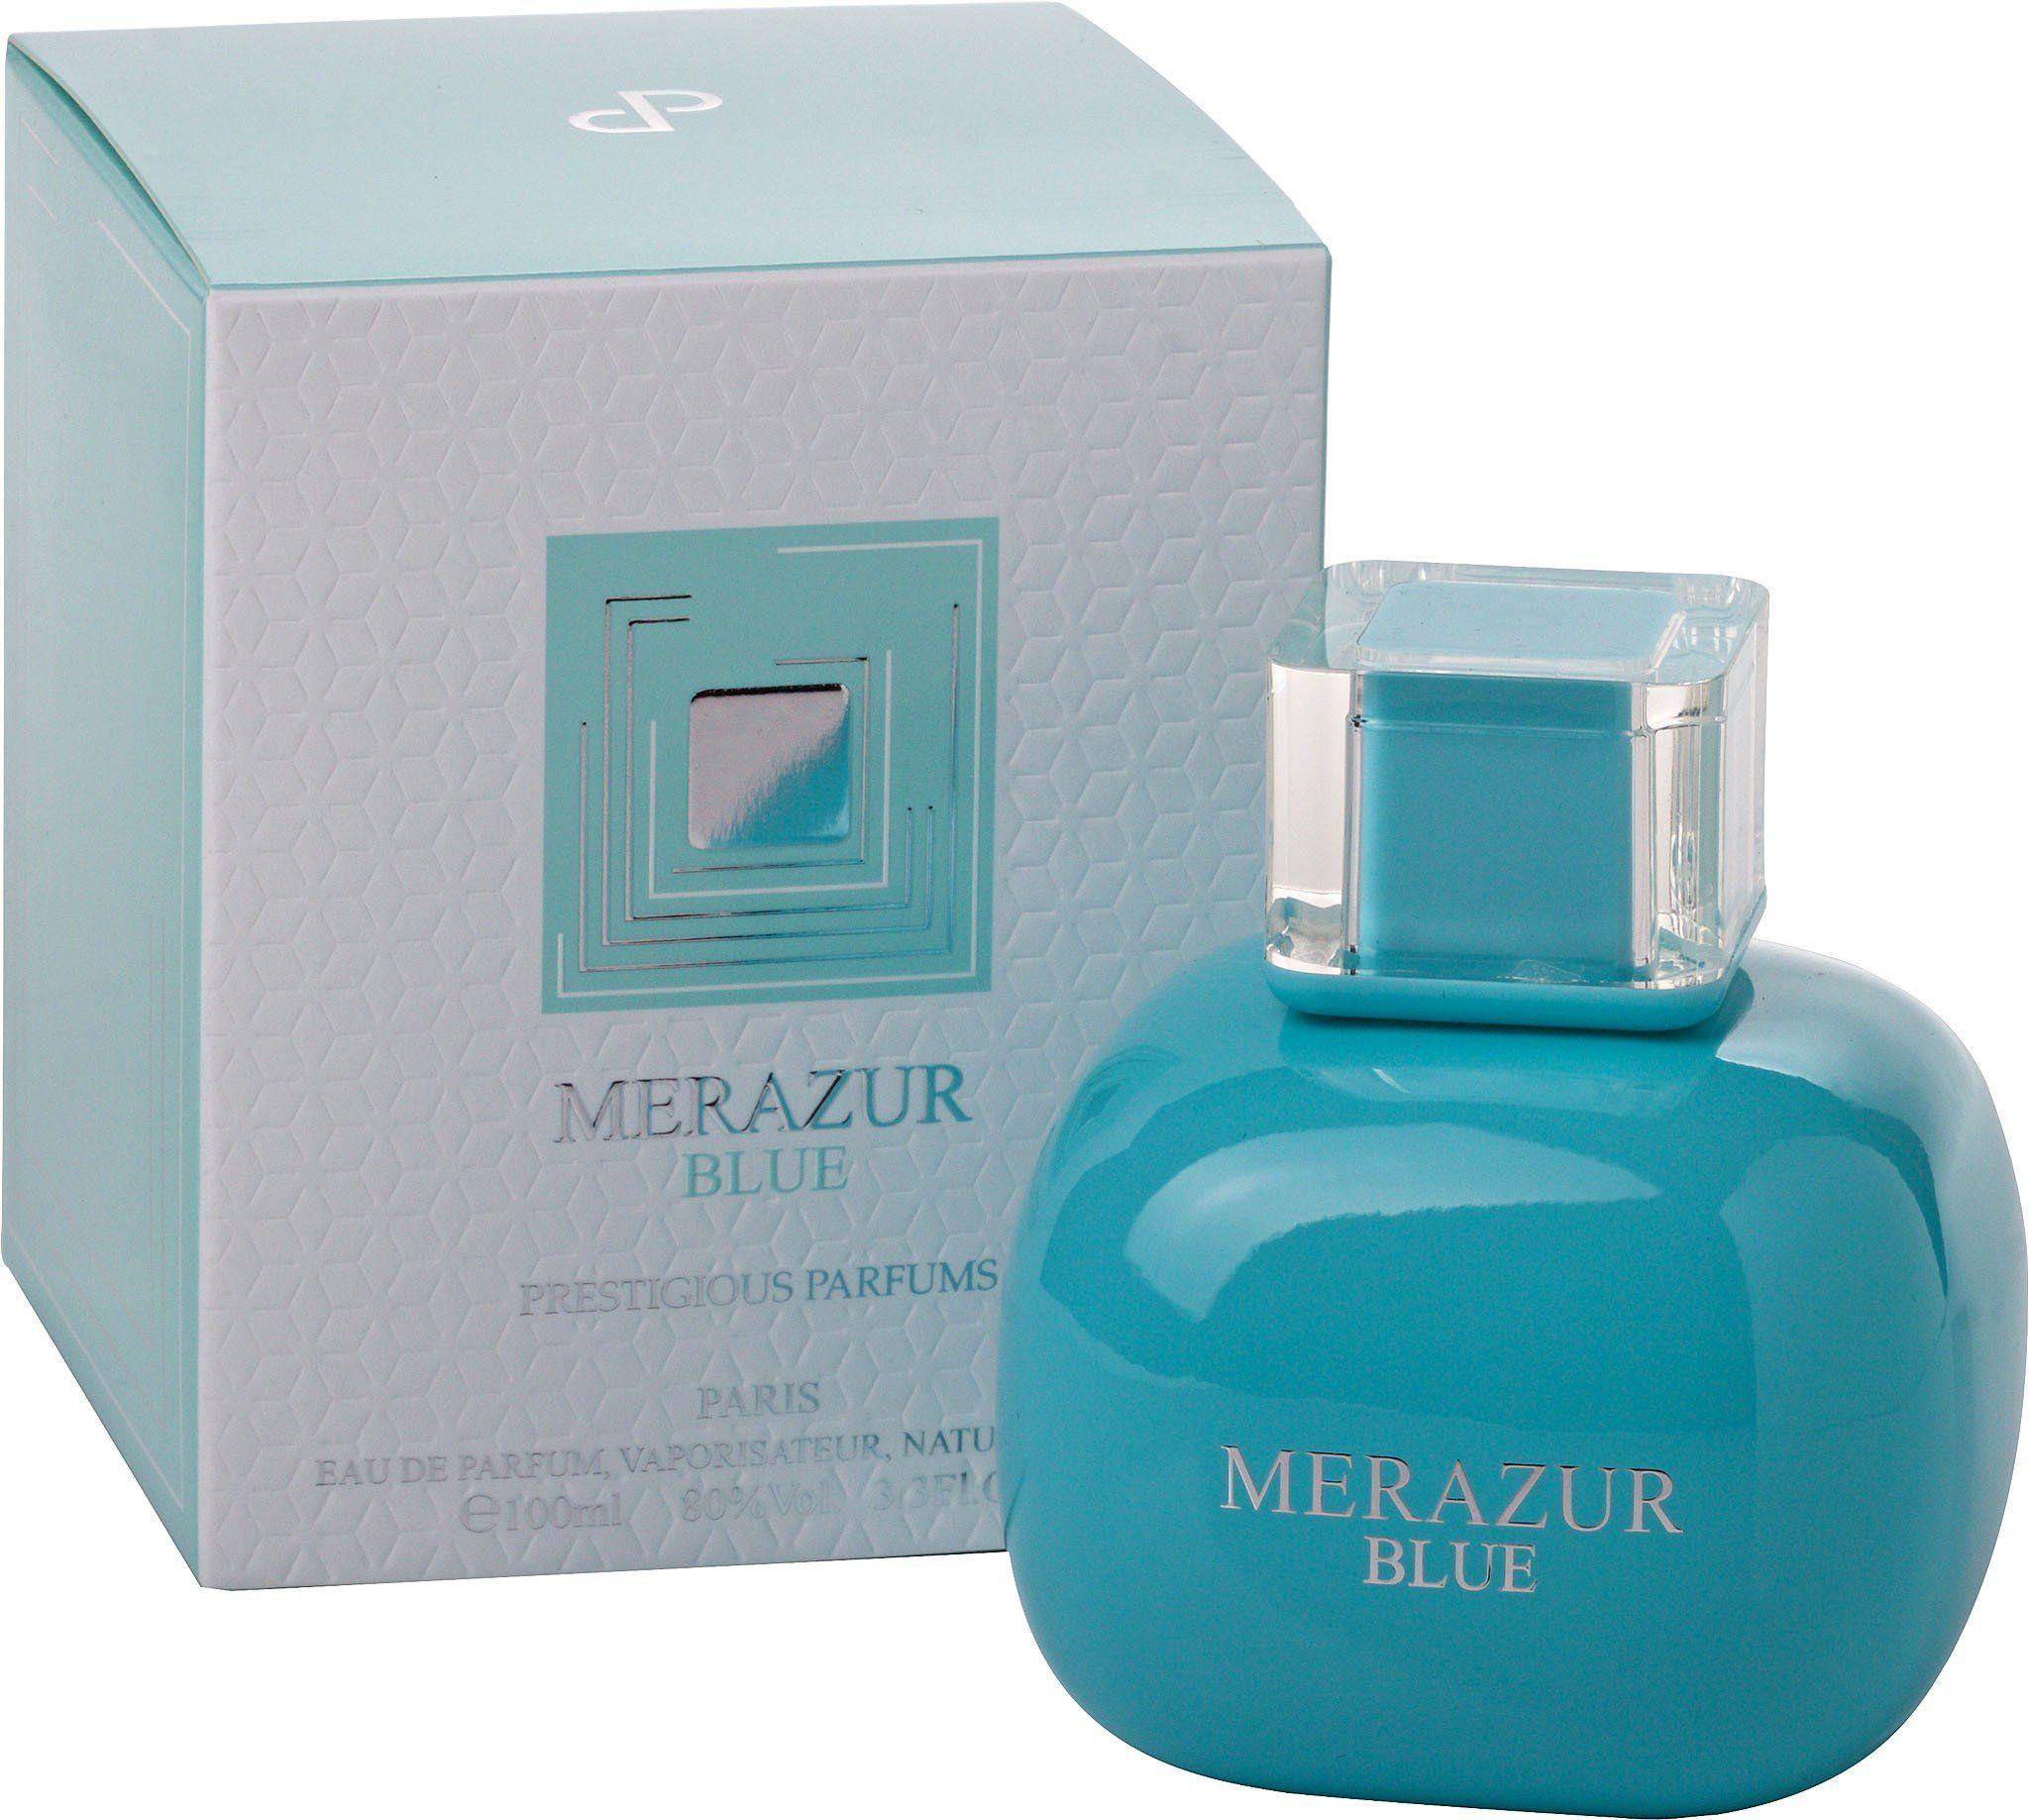 Merazur Blue Products Pinterest Perfume And La Rive Extreme Story For Men Edt 75ml By Prestige Parfums 33 Oz Women Edp